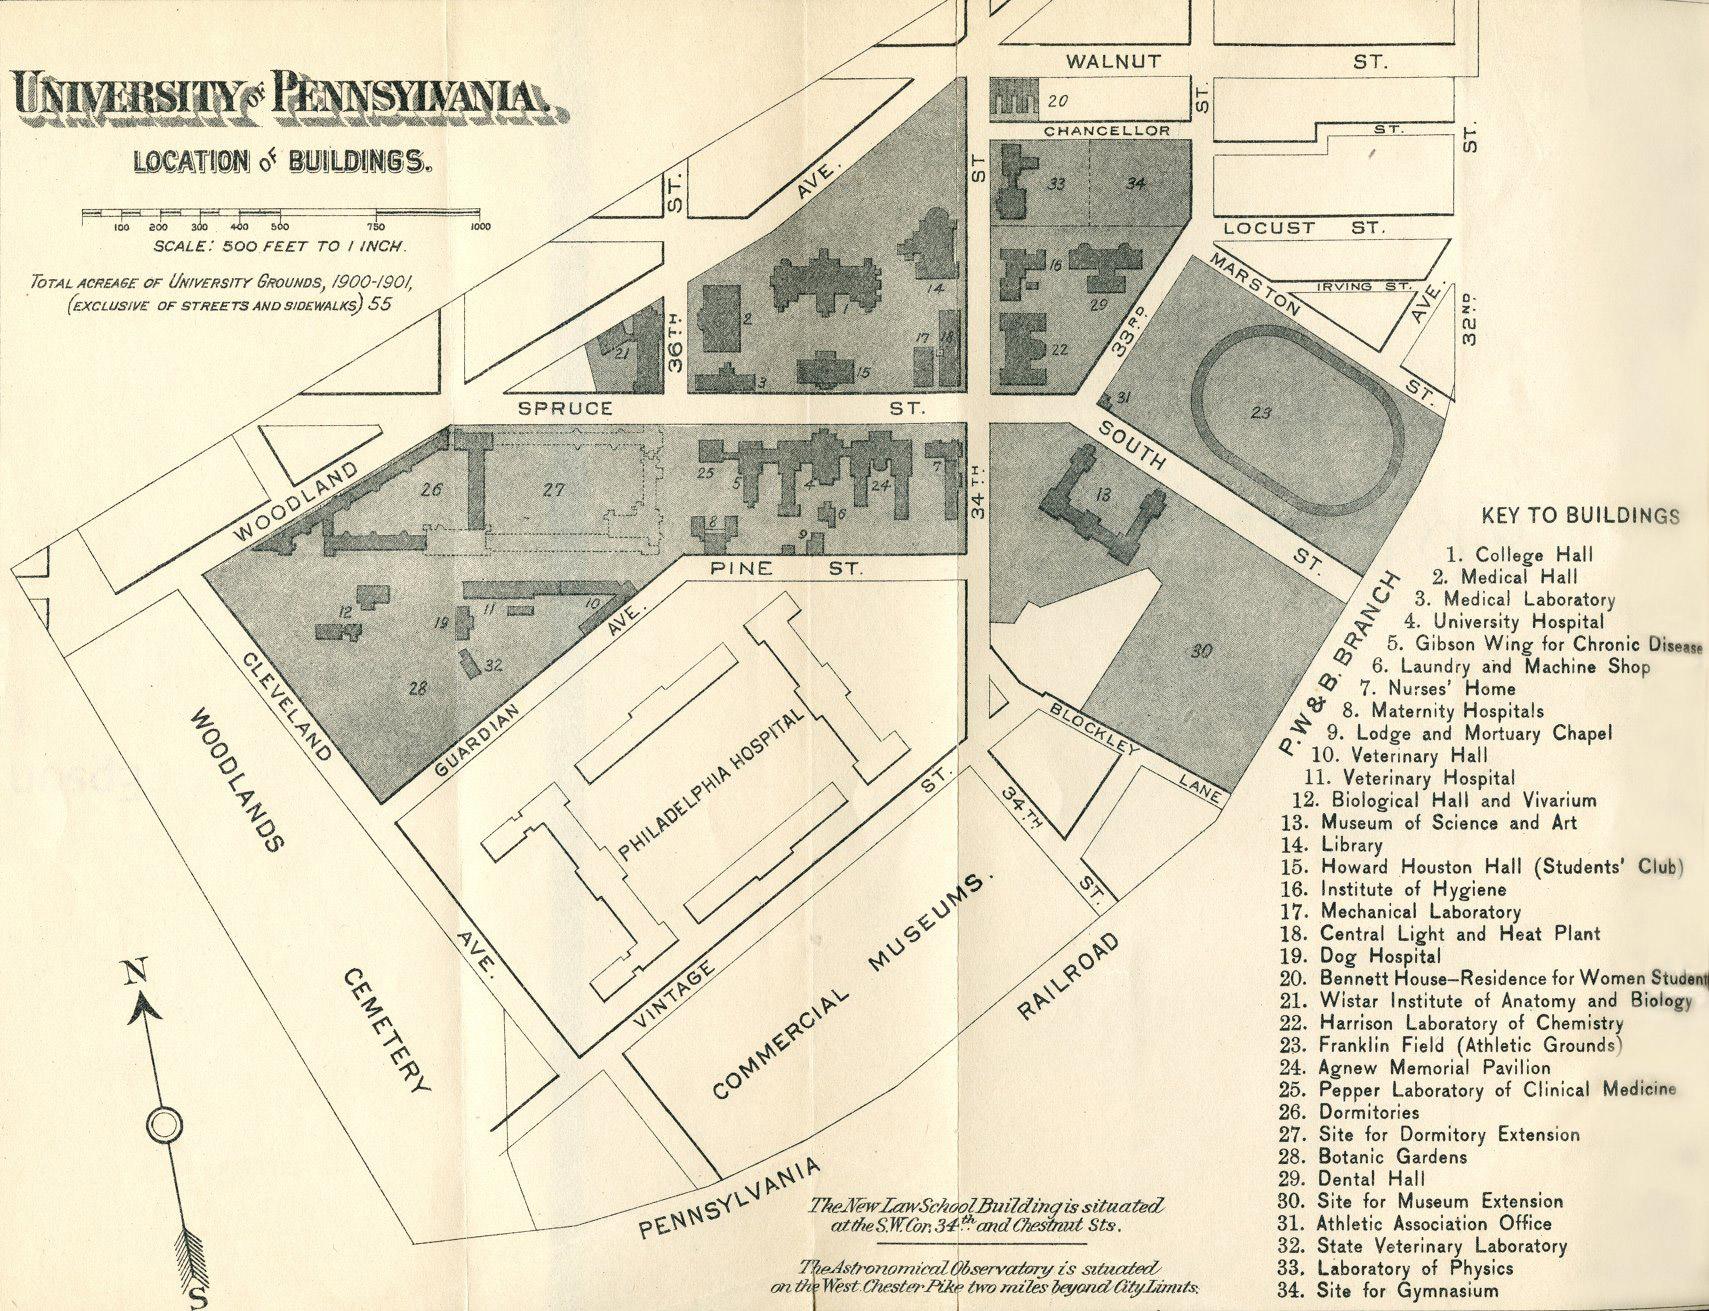 John A Logan Campus Map.Penn Campuses Before 1900 West Philadelphia Campus University